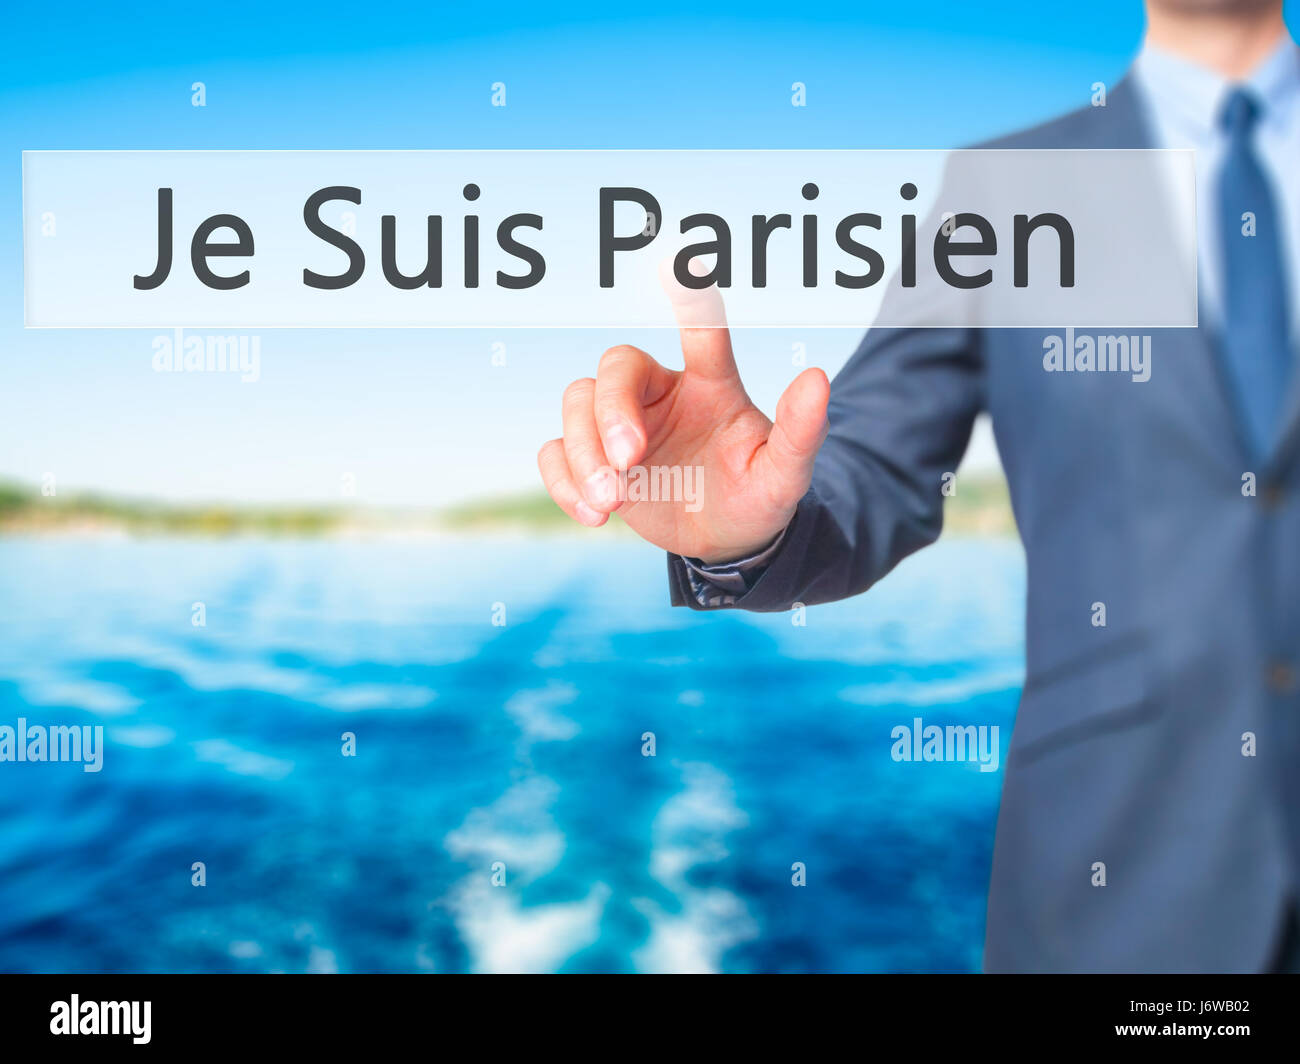 Je Suis Parisien ( I am Parisien)  - Businessman hand pressing button on touch screen interface. Business, technology, Stock Photo